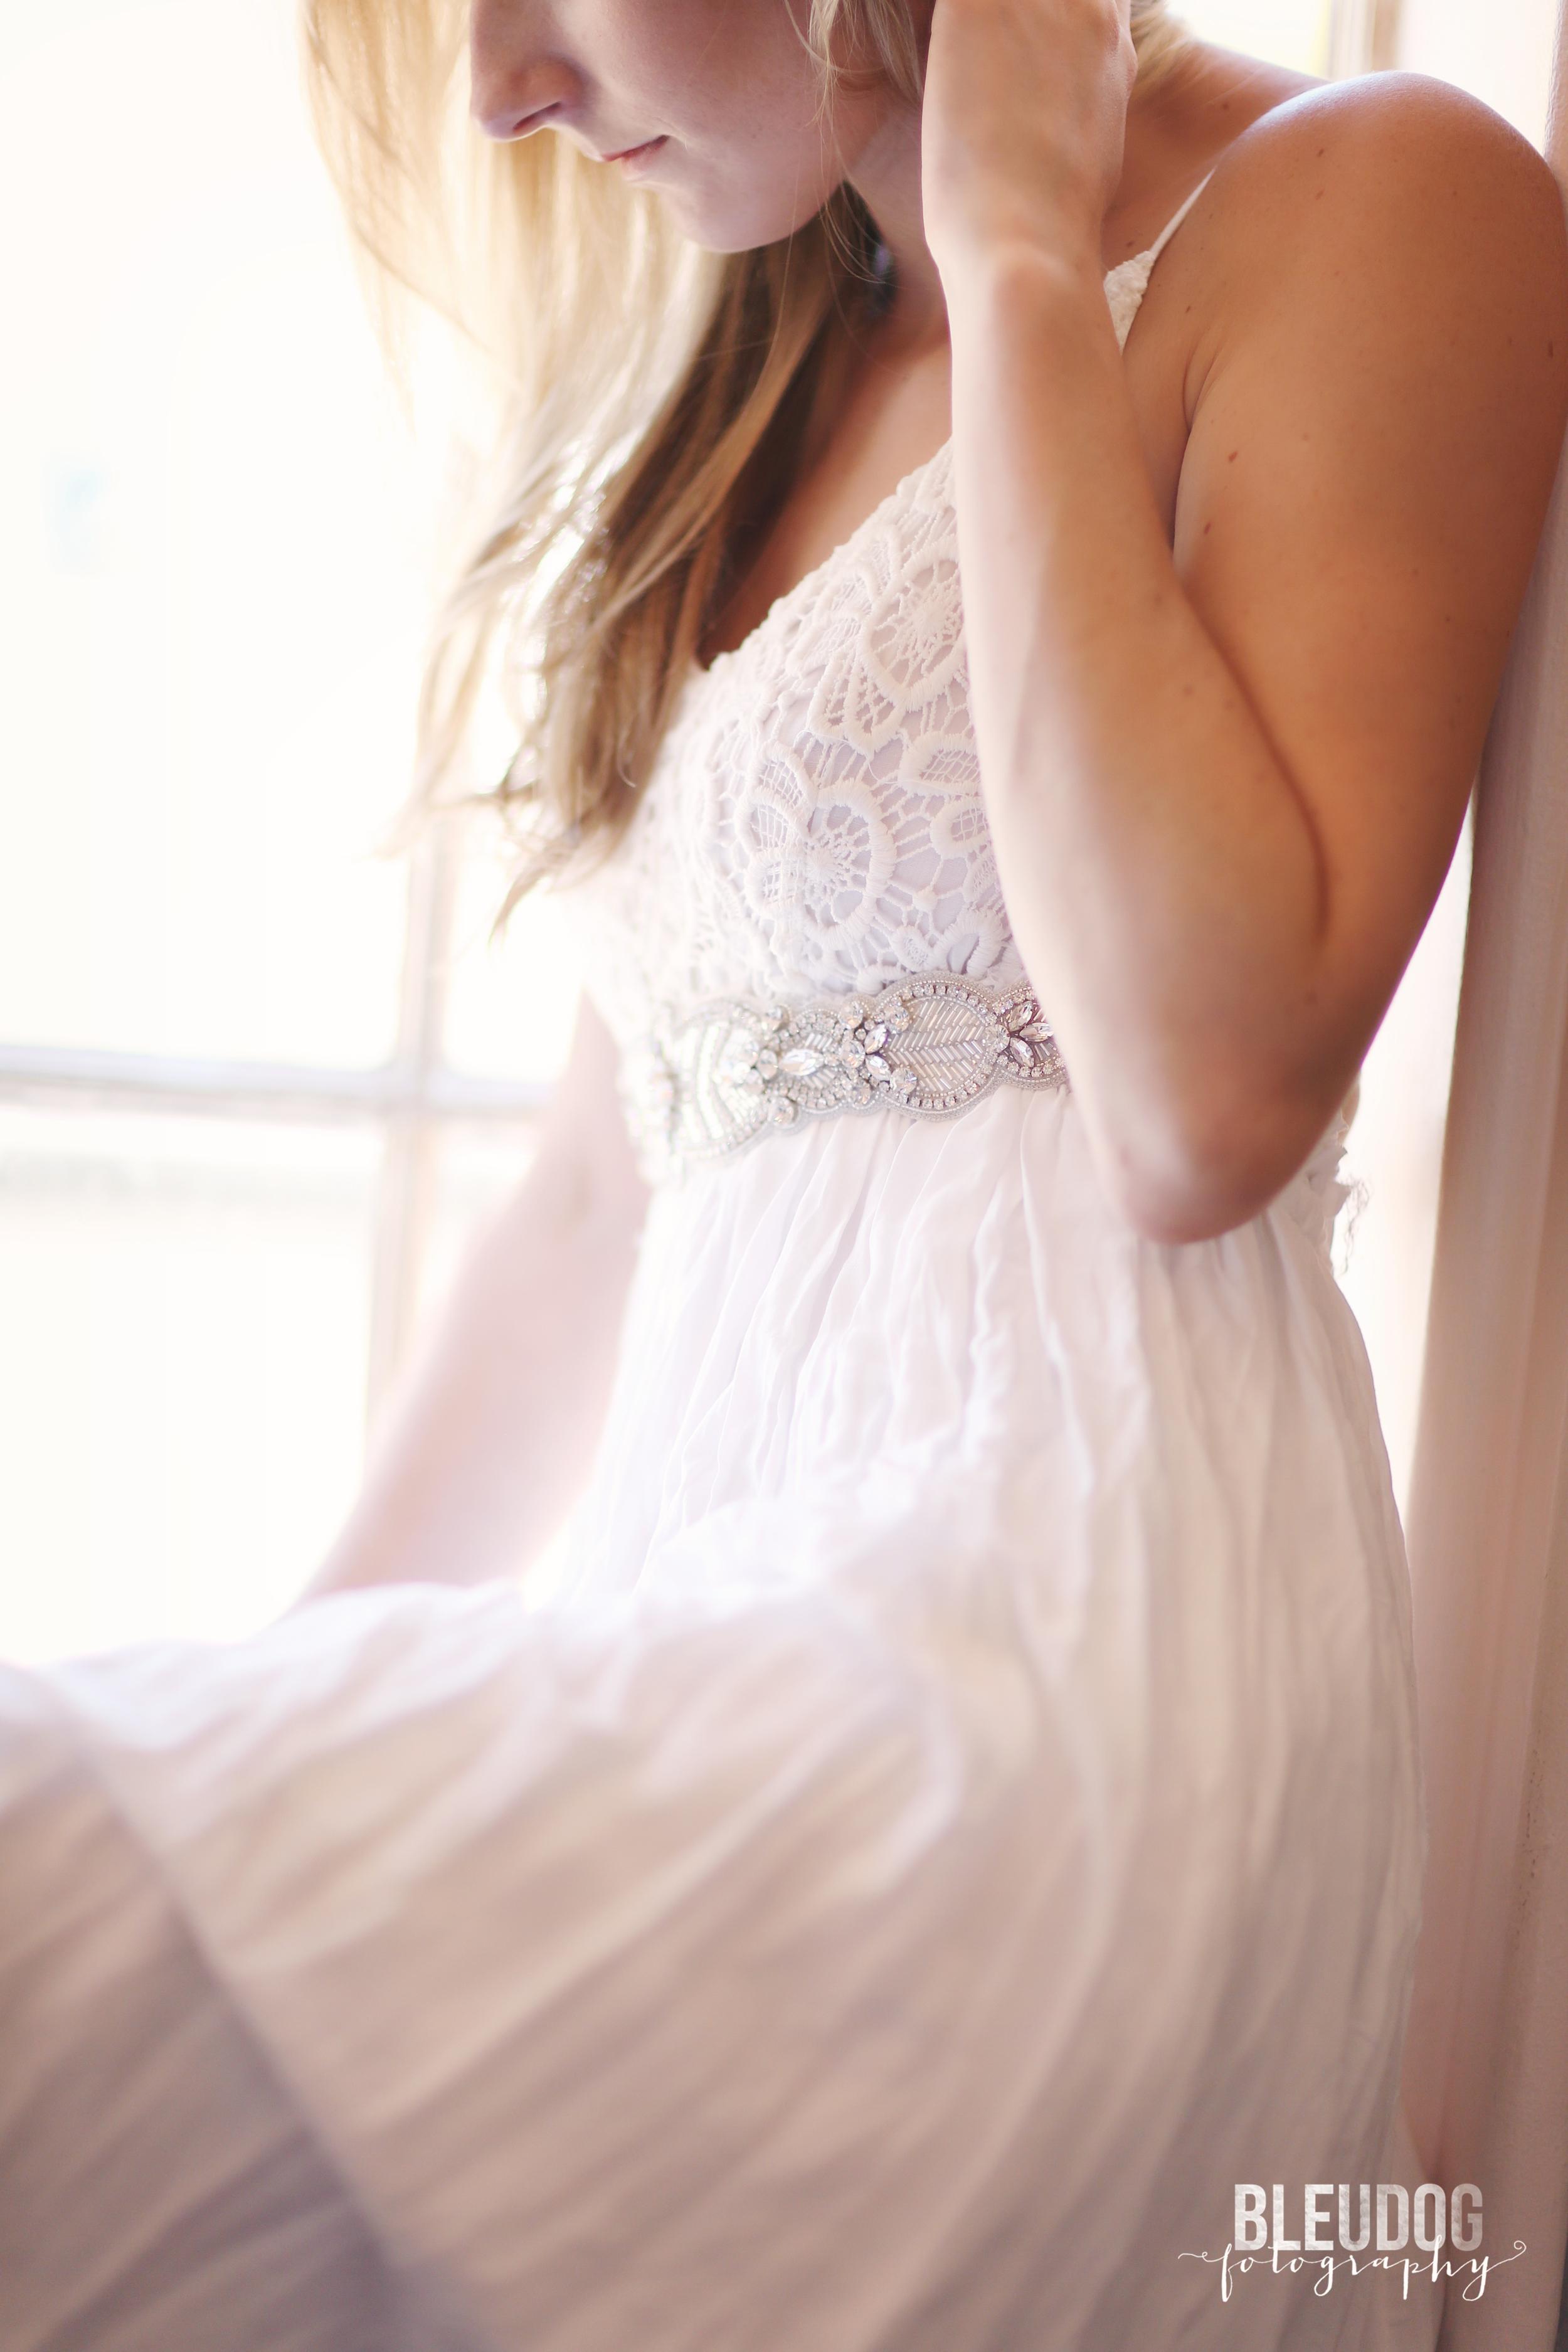 The Amanda Belt by Something Treasured // The OVerwhelmed Bride Wedding Blog + Southern California Wedding Planner